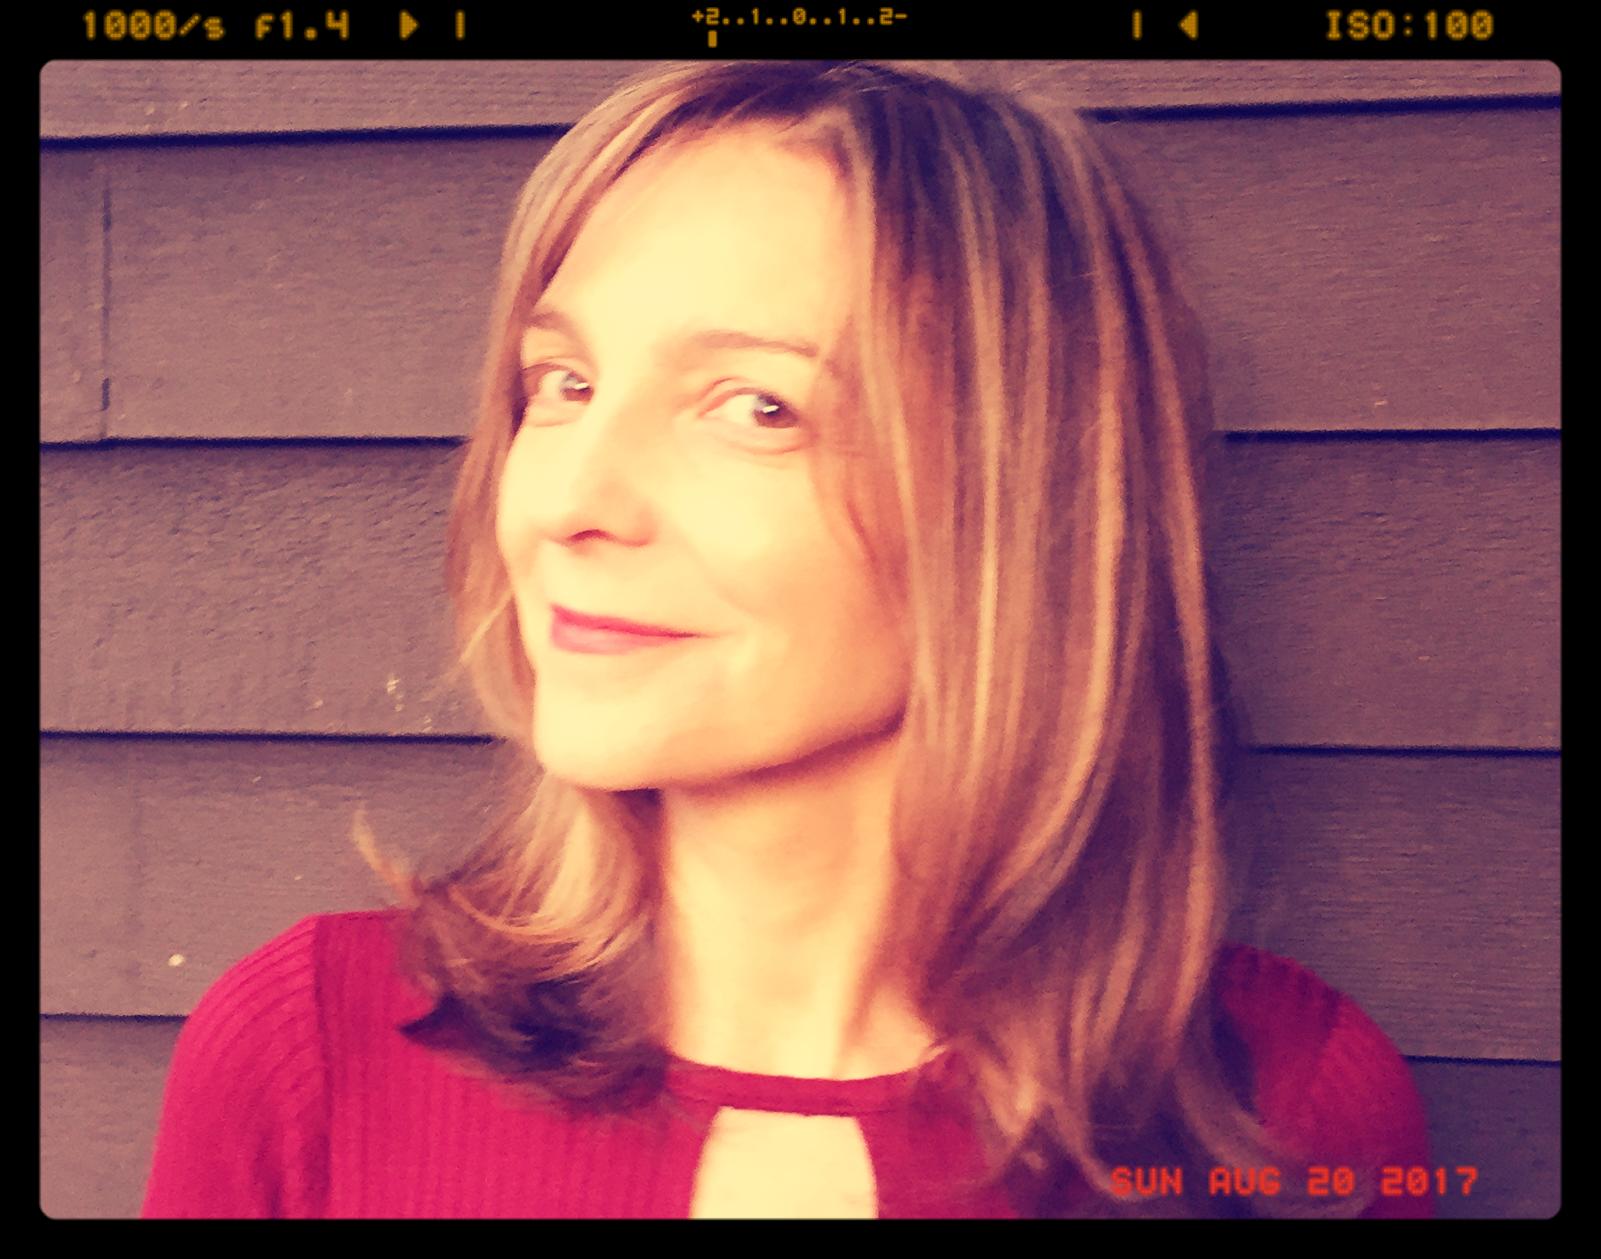 Pamela PavliscakResearcher, Emotionally Intelligent Tech, and Faculty, Pratt Institute - THE INTERNET OF YOU